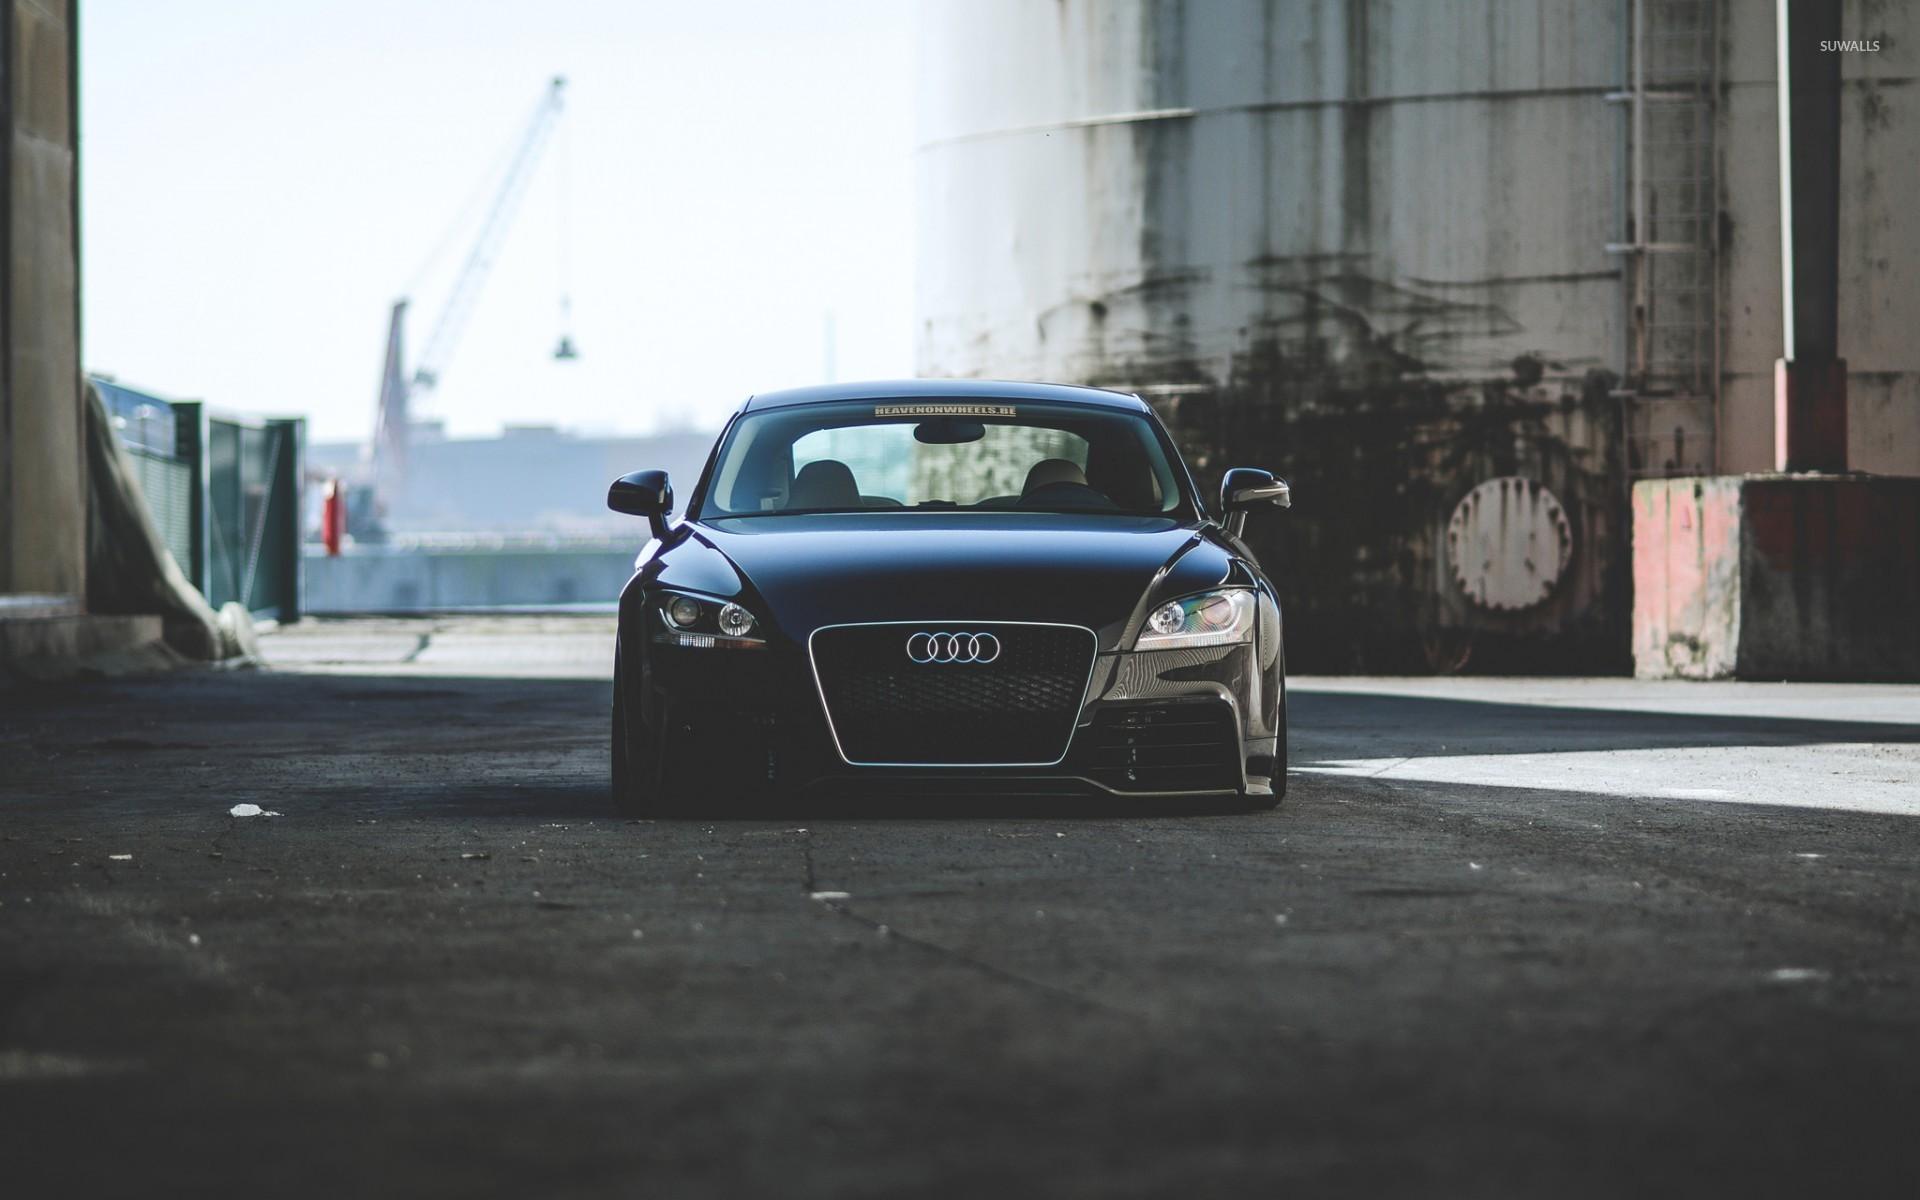 Audi Tt 8 Wallpaper Car Wallpapers 41716